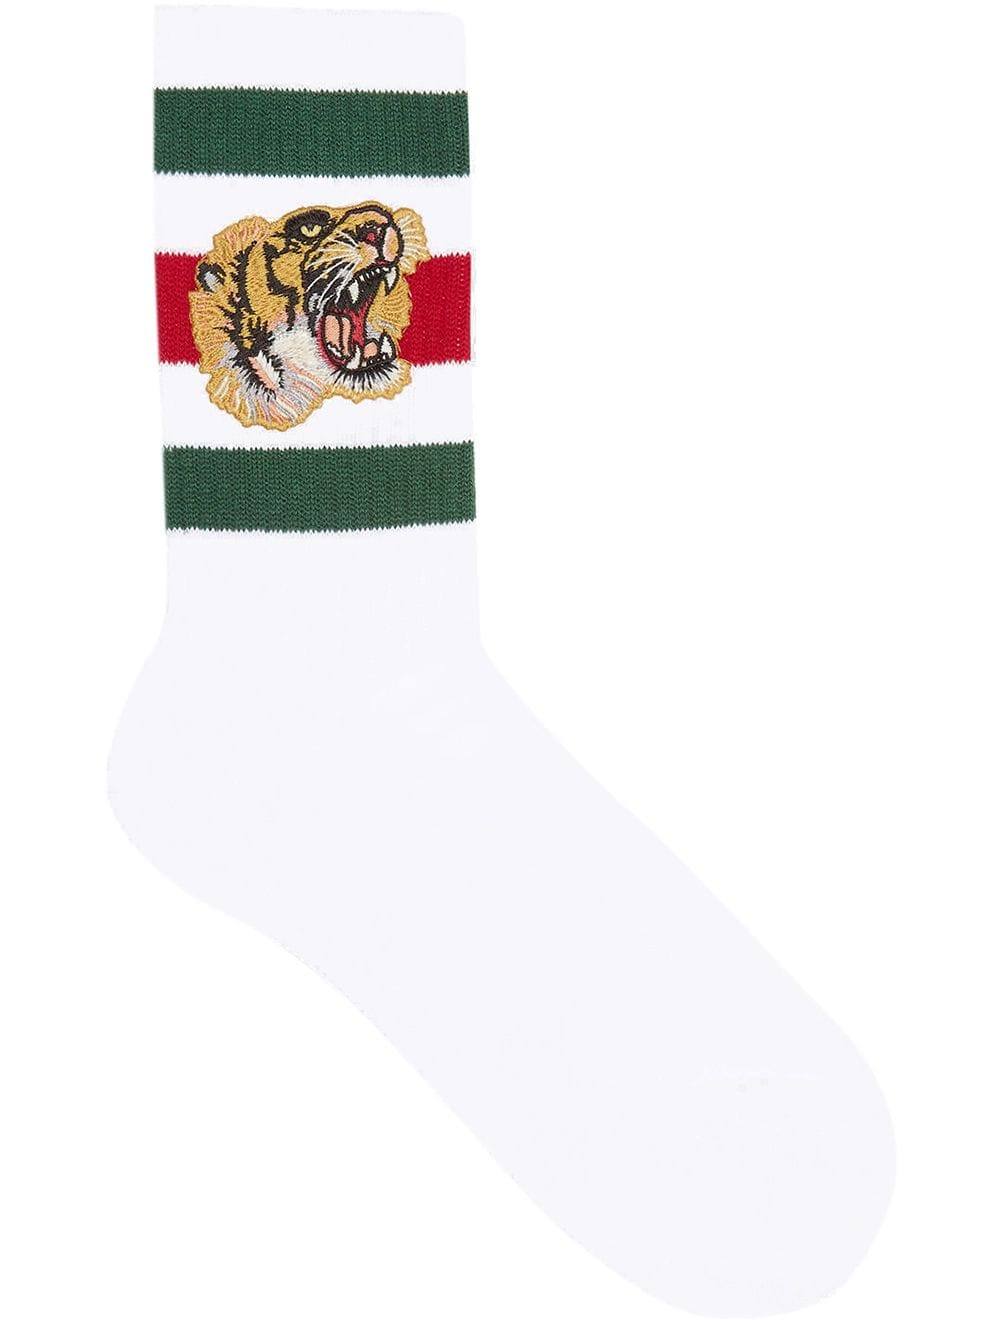 gucci sokken, thuiswerken, fashion items, corona